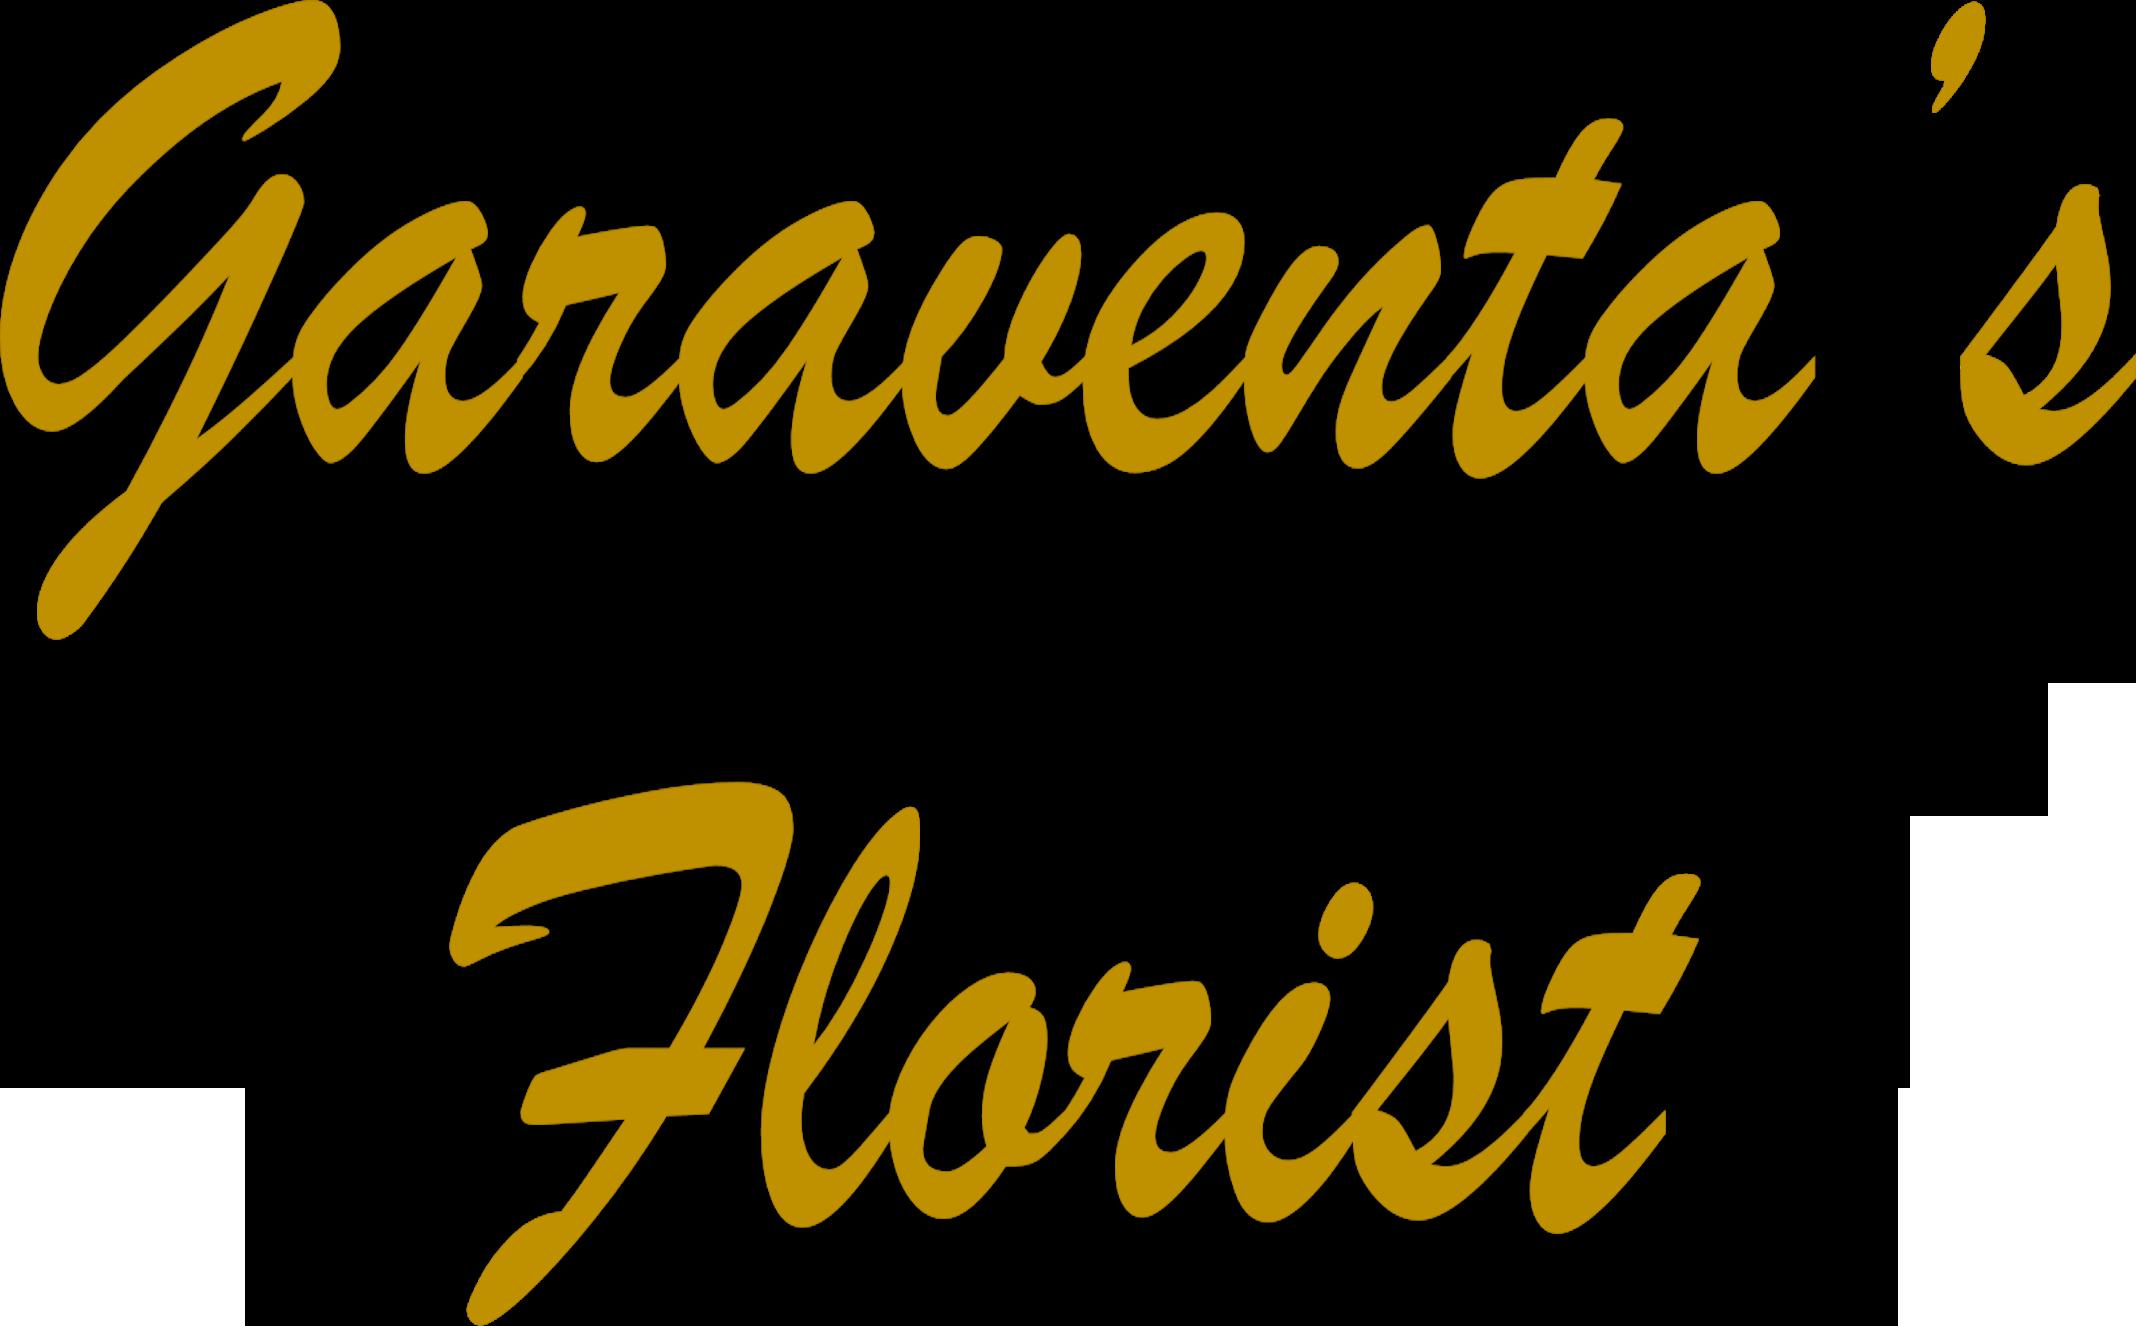 Napa florist flower delivery by garaventa florist izmirmasajfo